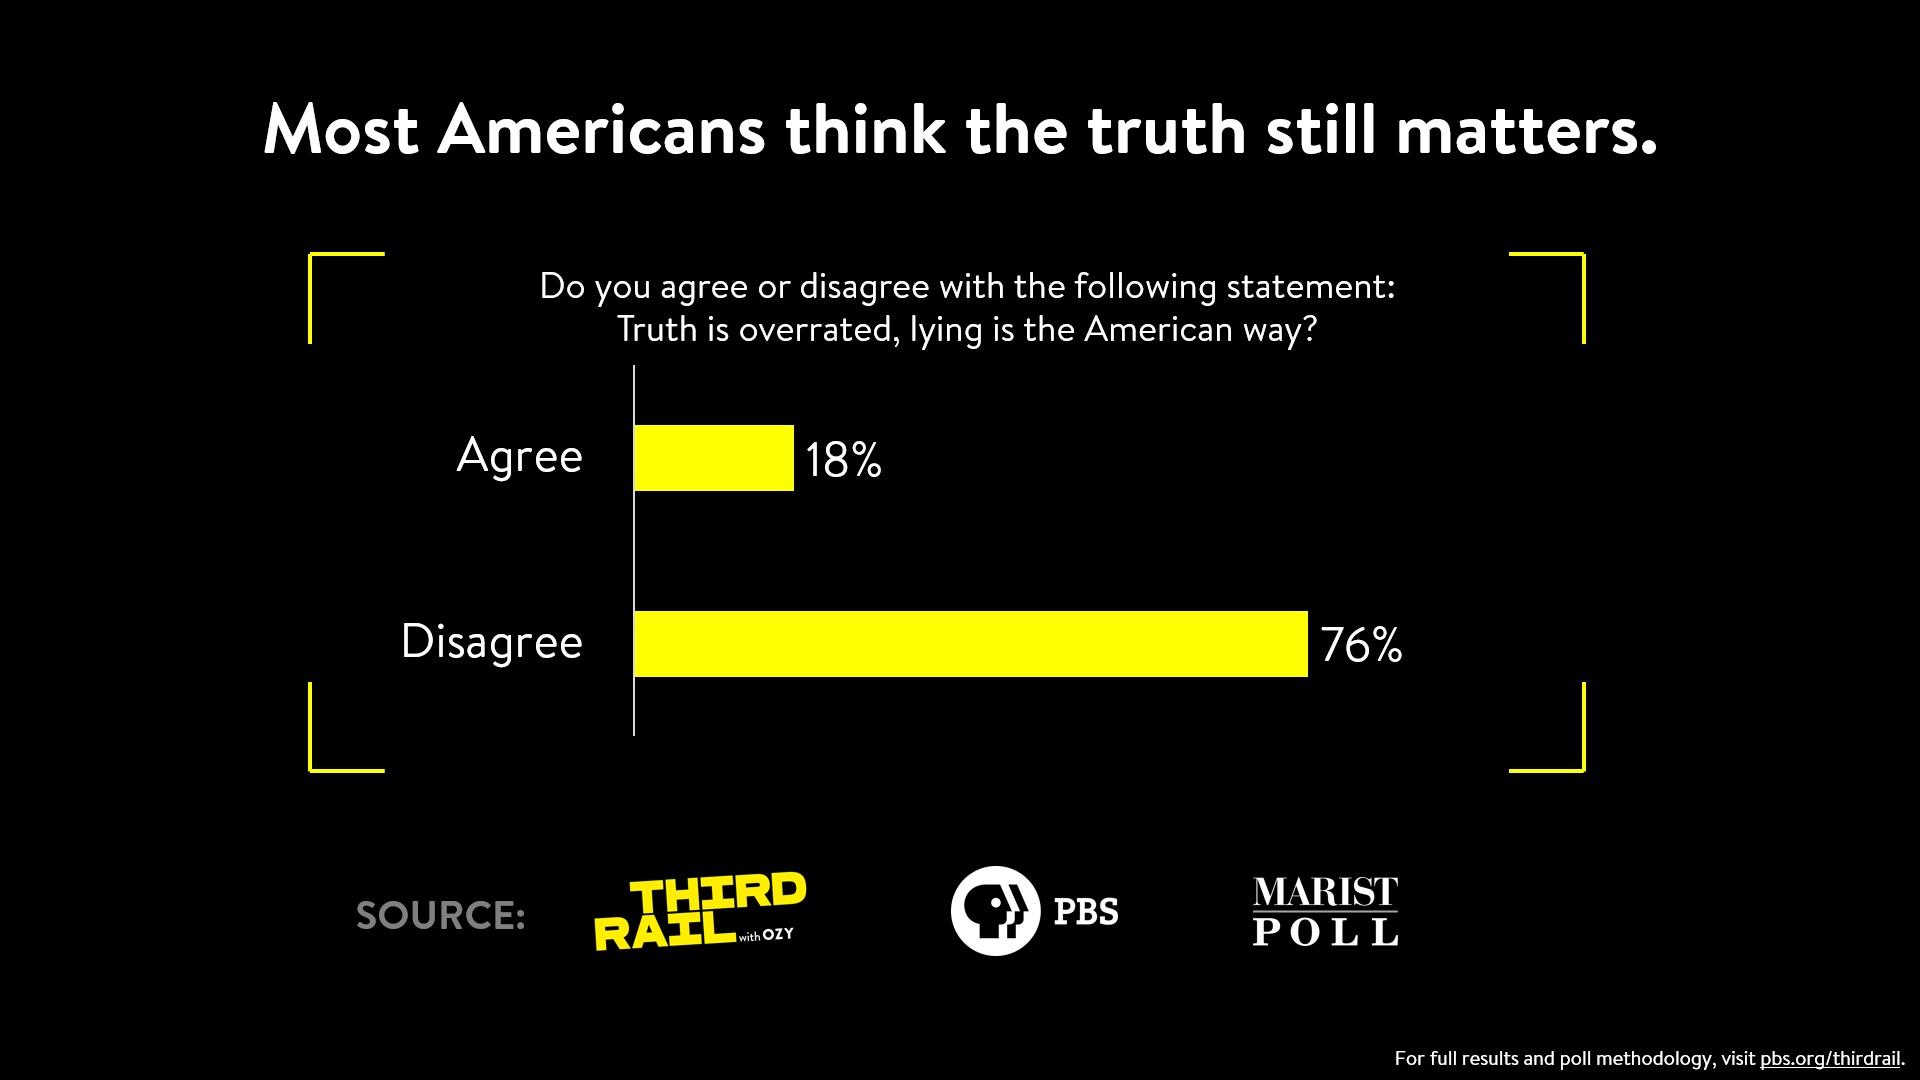 Two-Thirds of Americans Believe Marriage is Inevitable